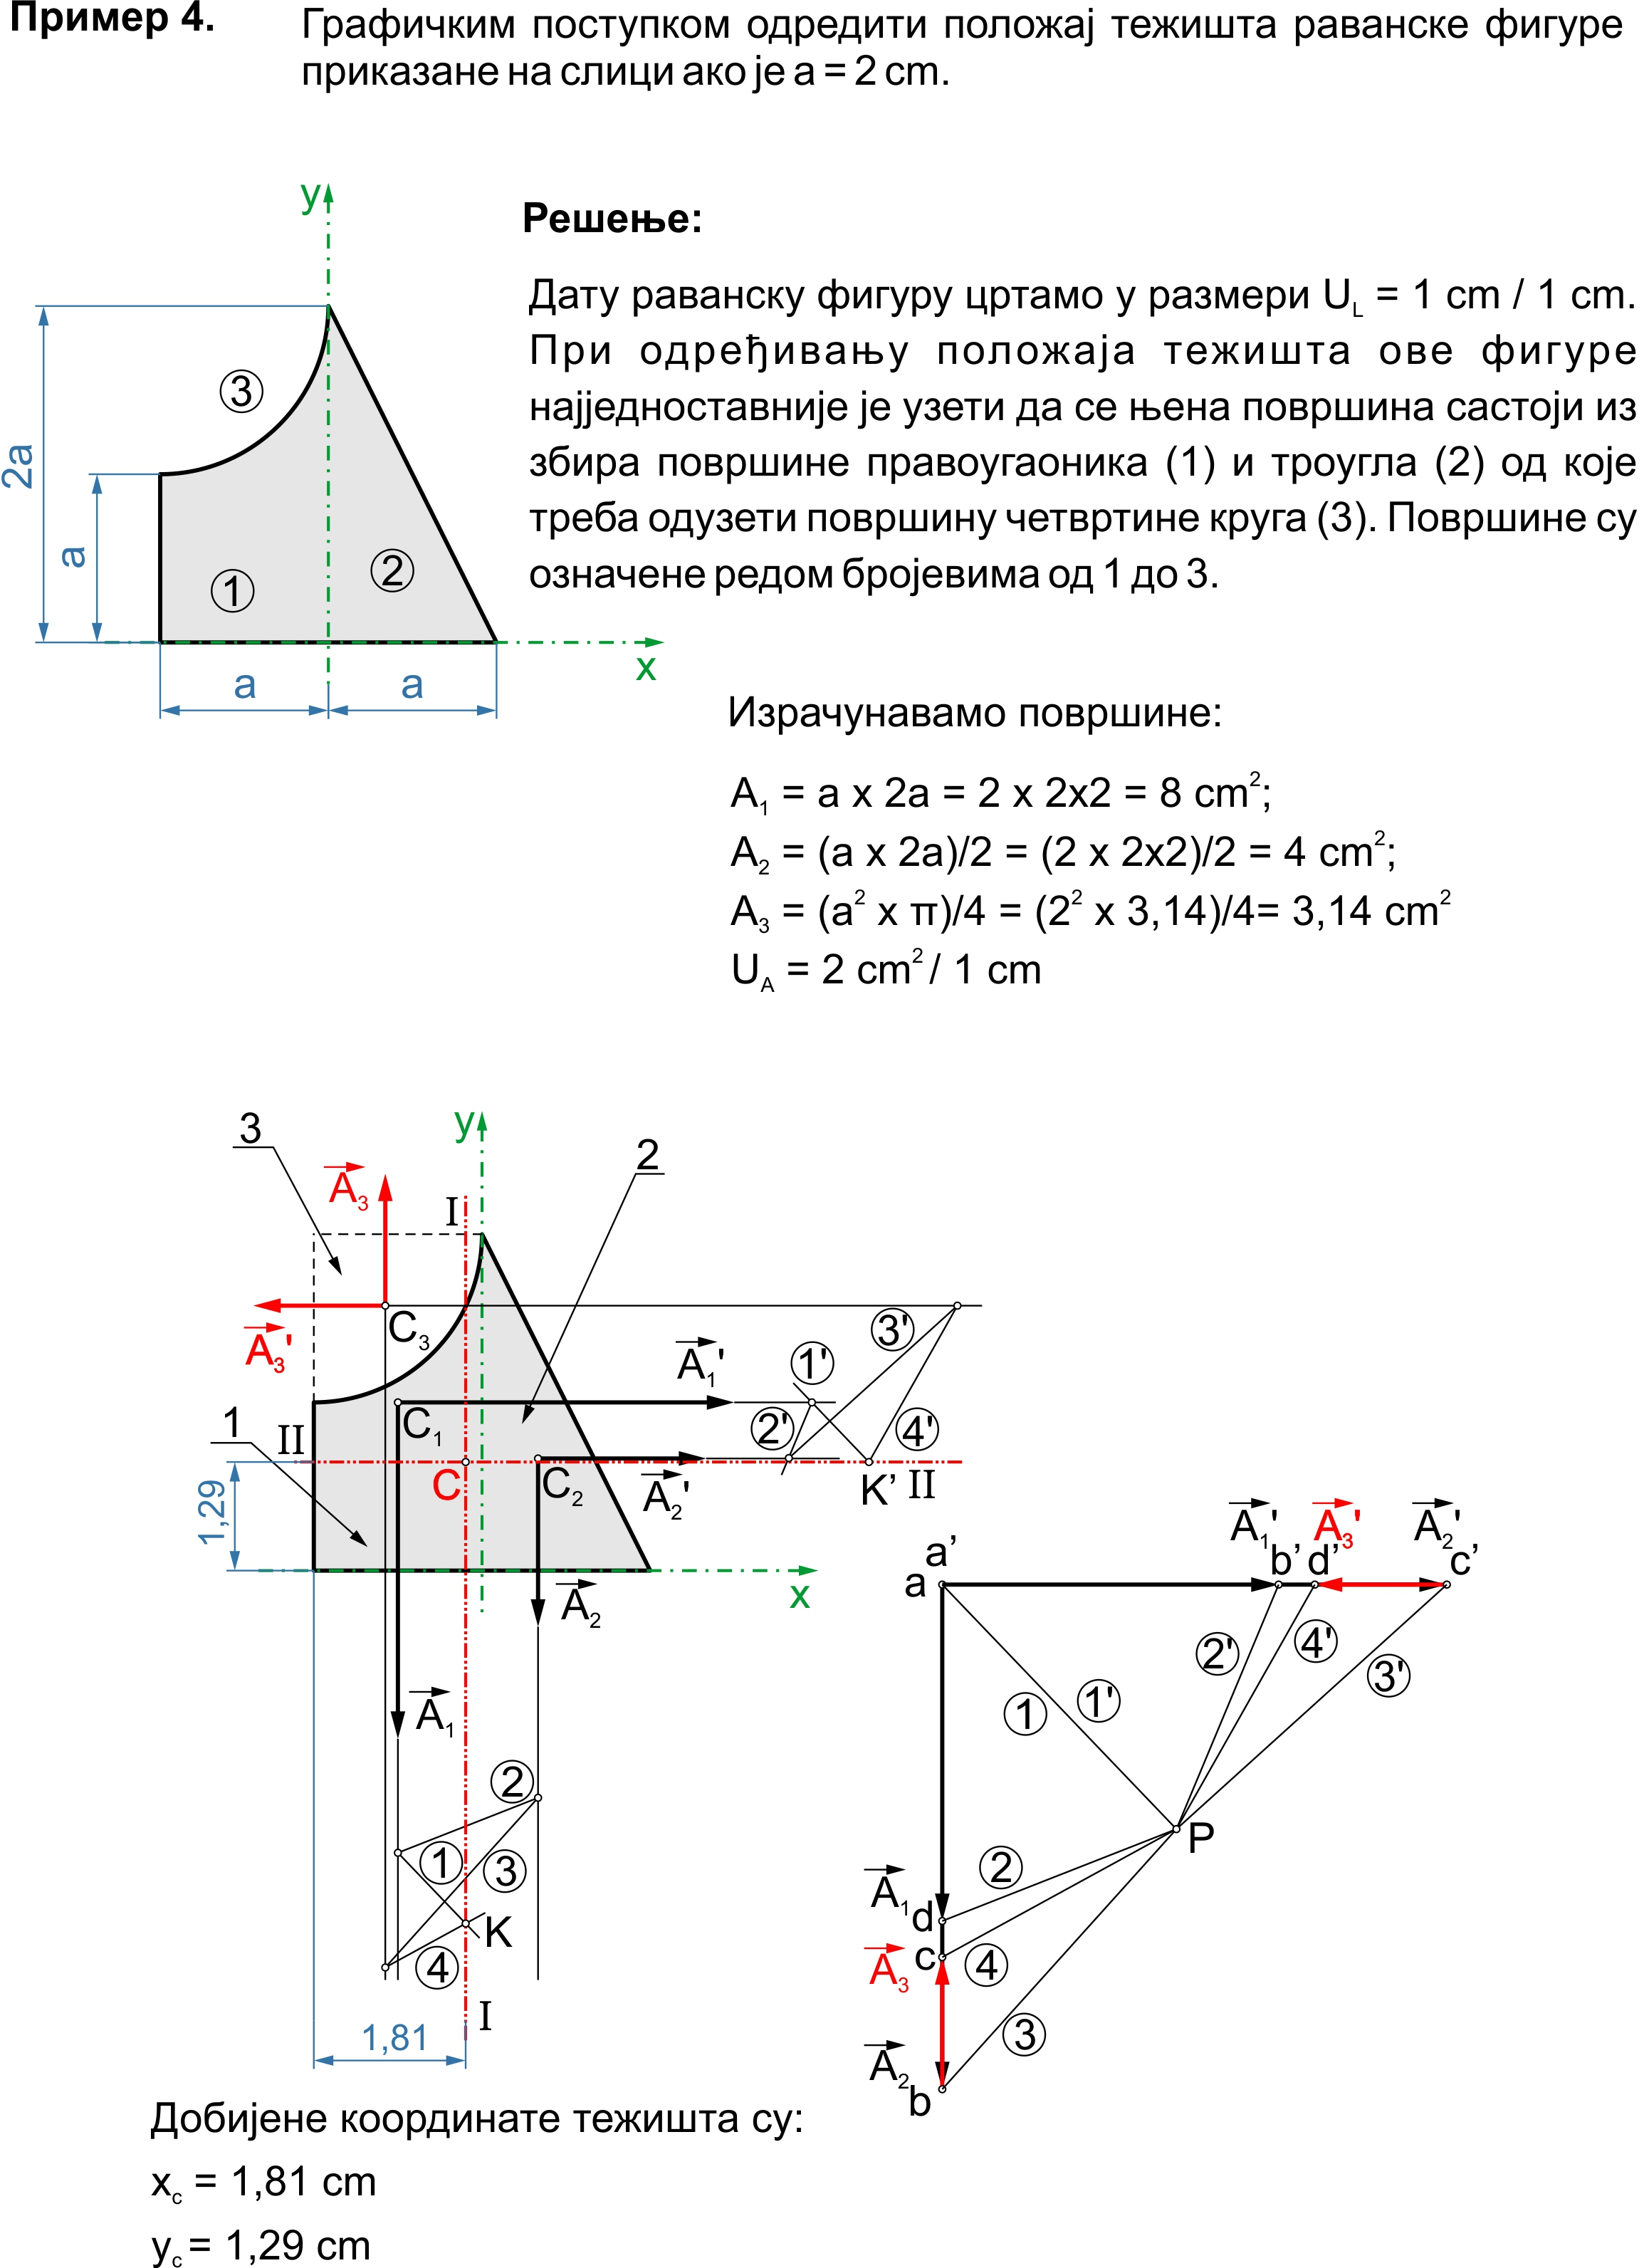 Teziste ravanske figure primer 4